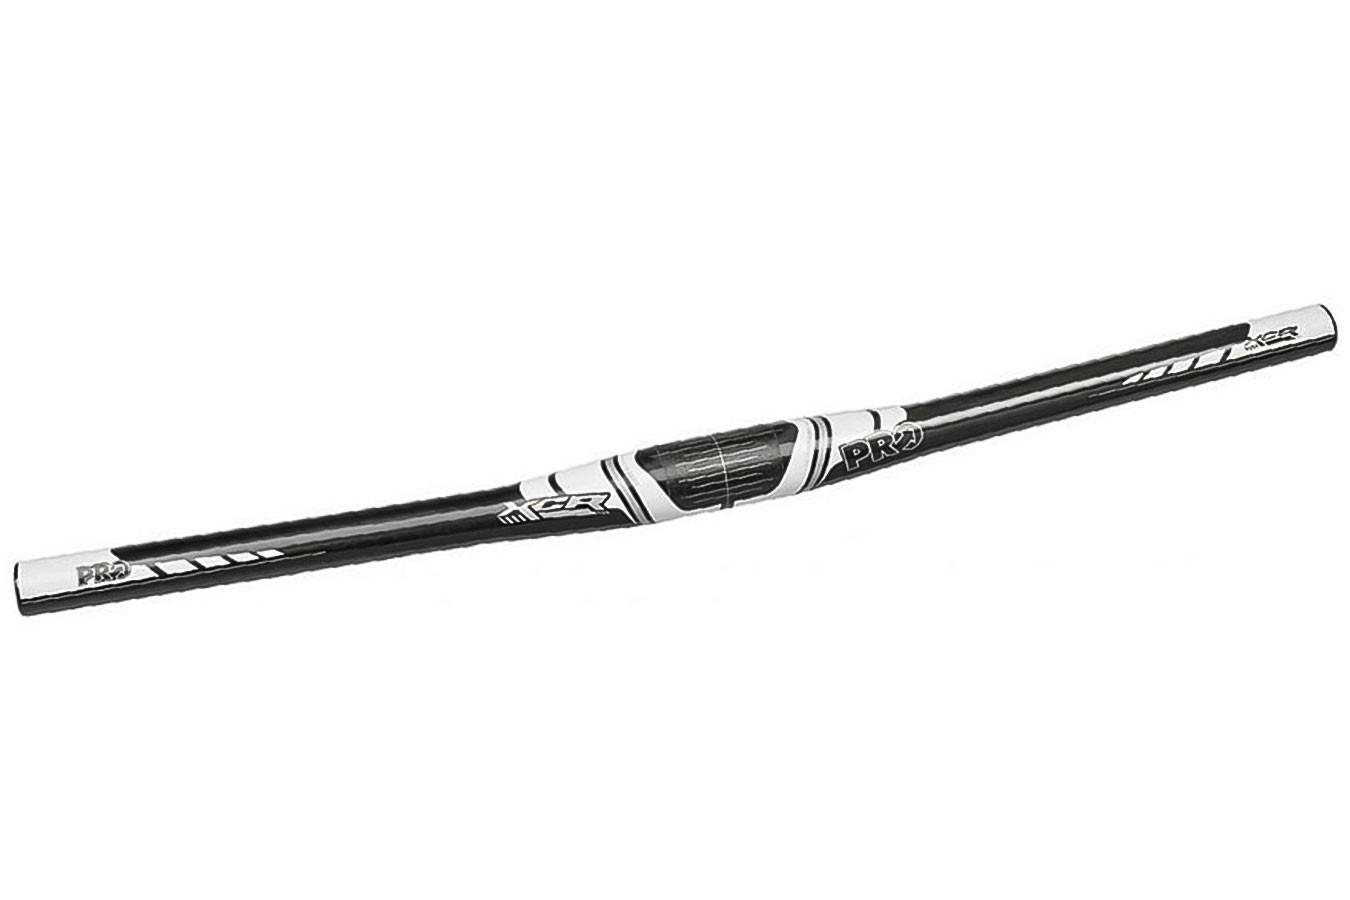 Guidão MTB Carbon 580mm Reto XCR - Pro